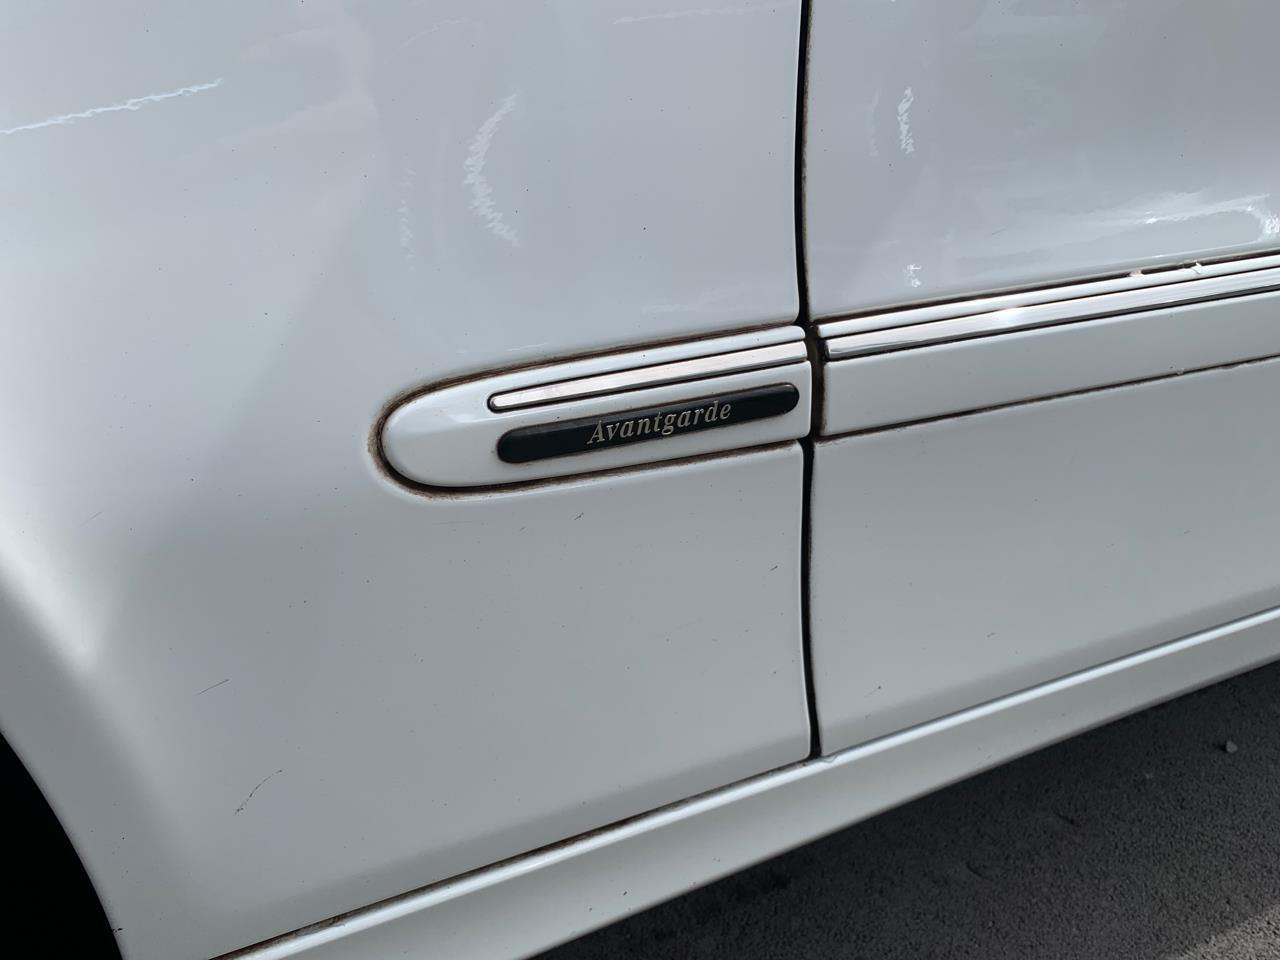 image-9, 2007 MercedesBenz E 350 Avant Garde 35,000kms at Christchurch